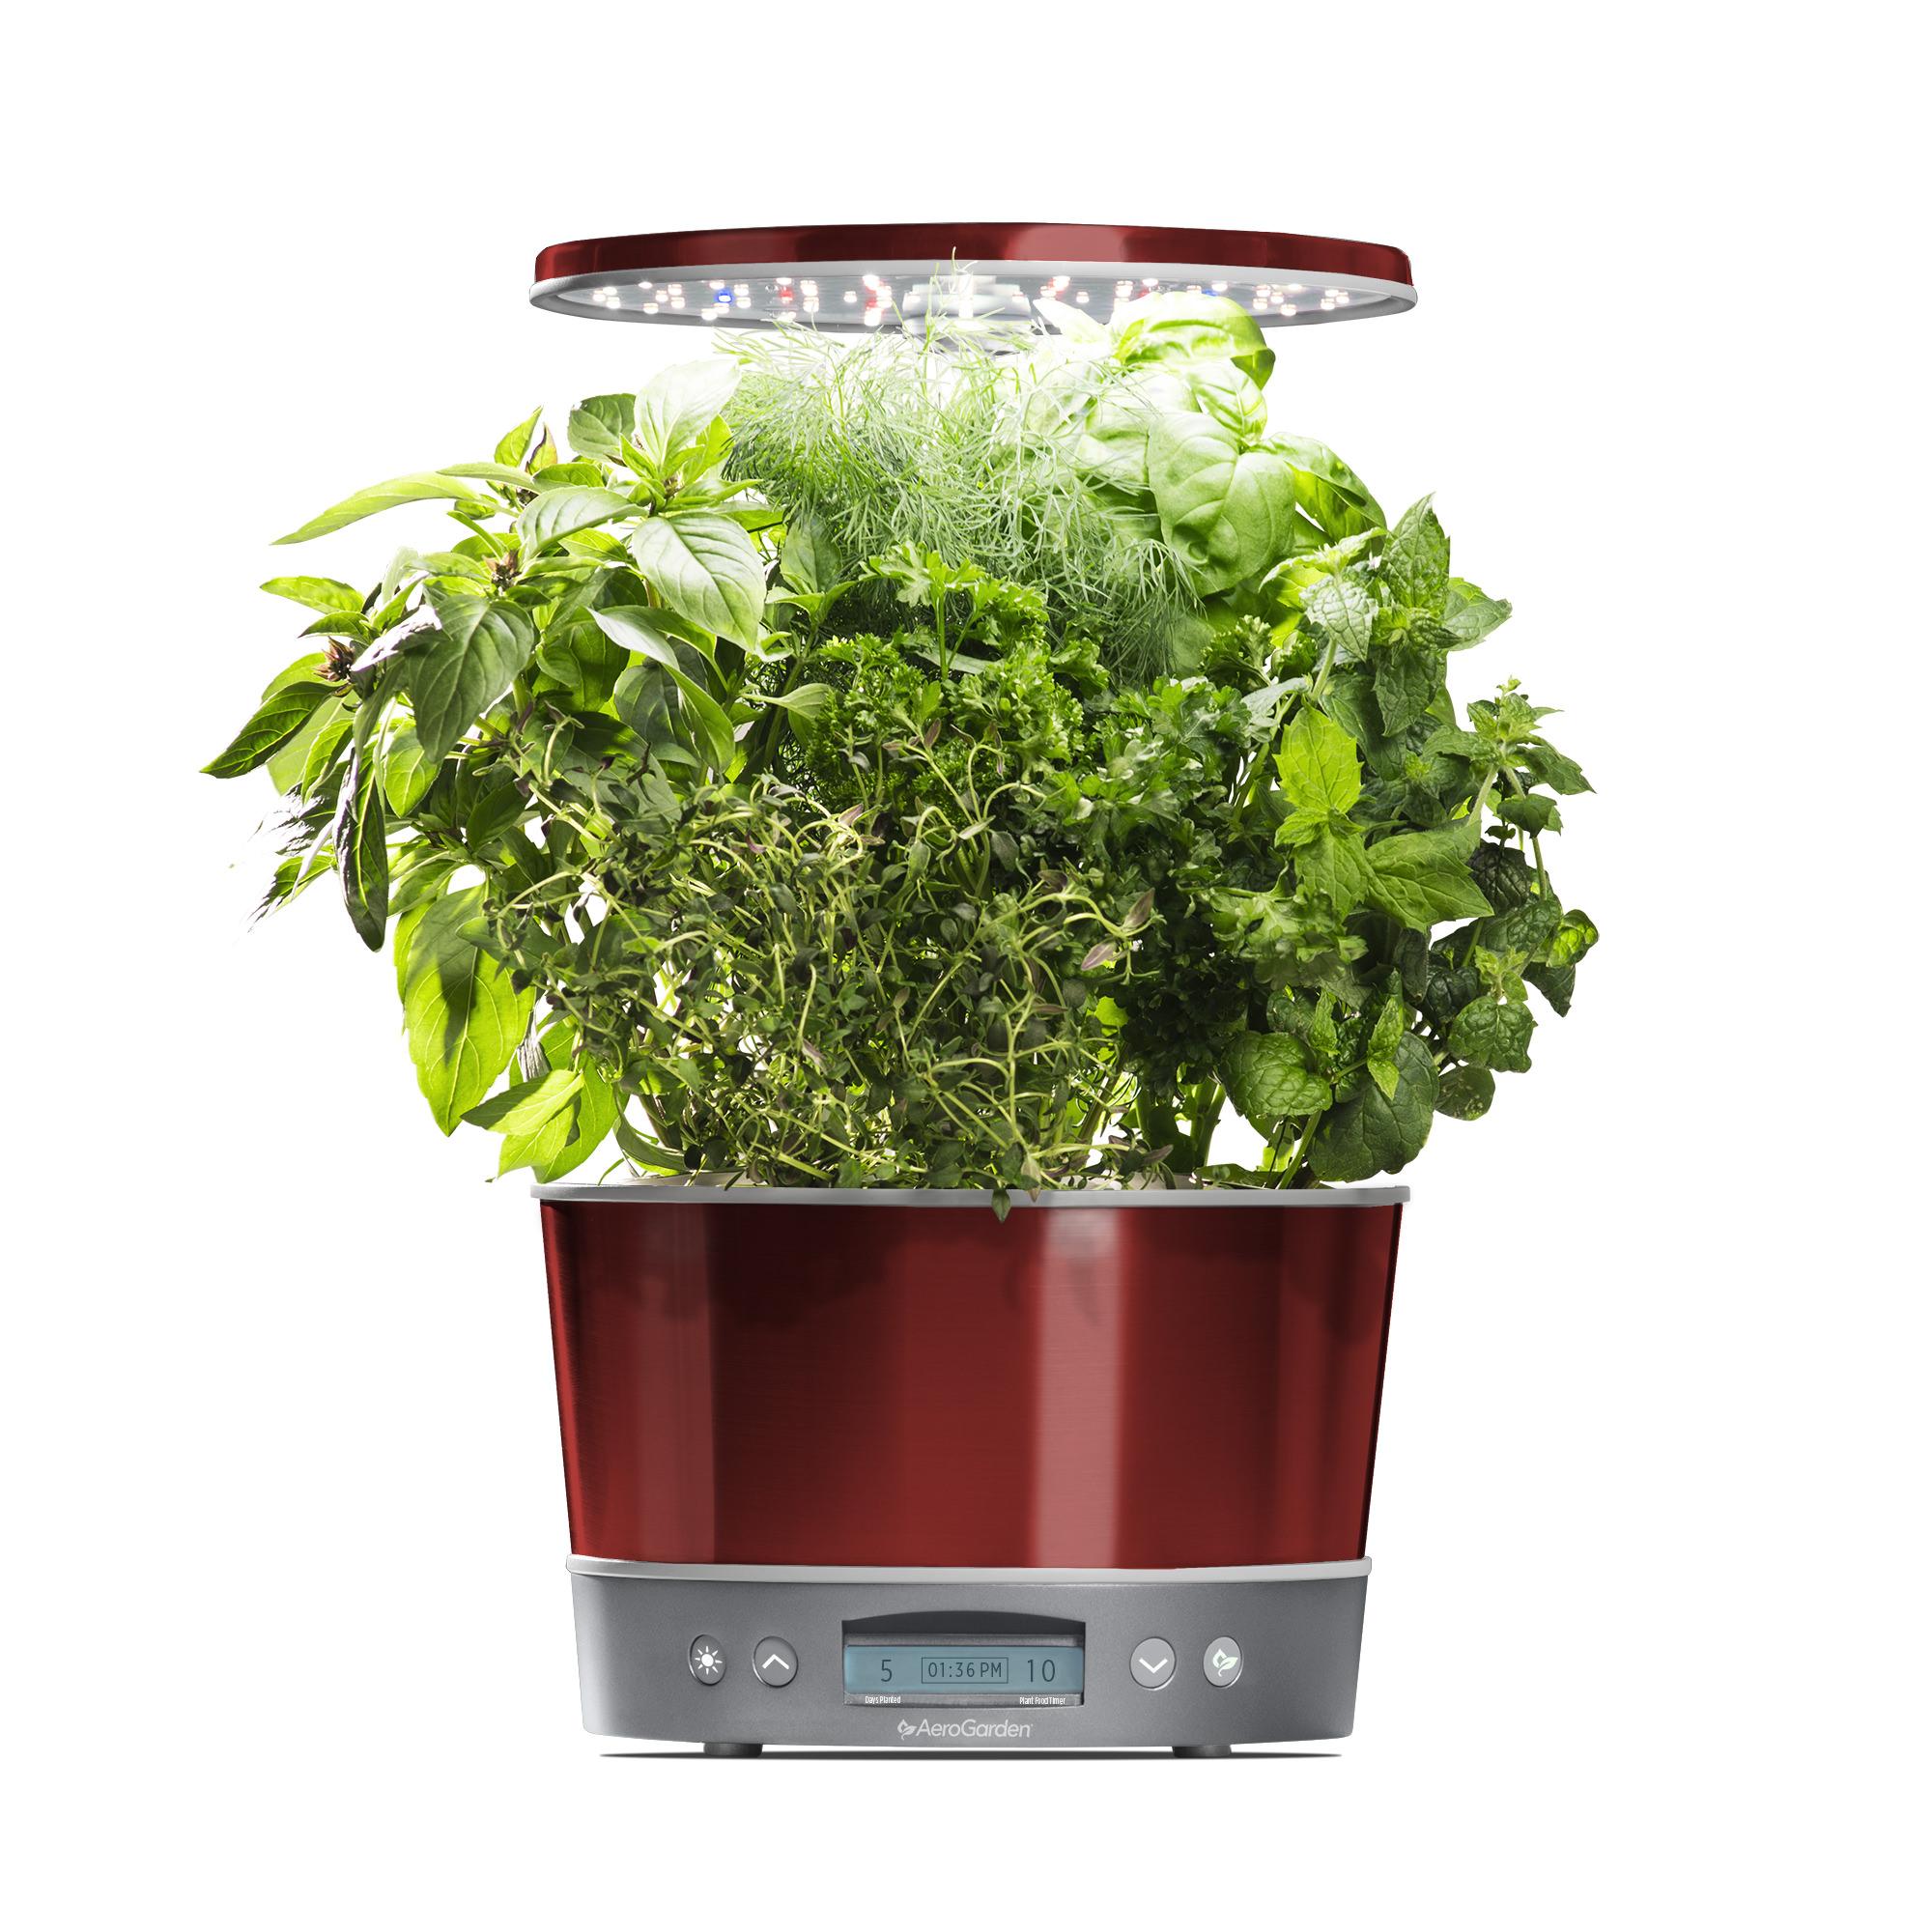 AeroGarden Harvest Elite 360, Stainless with Gourmet Herbs Seed Kit